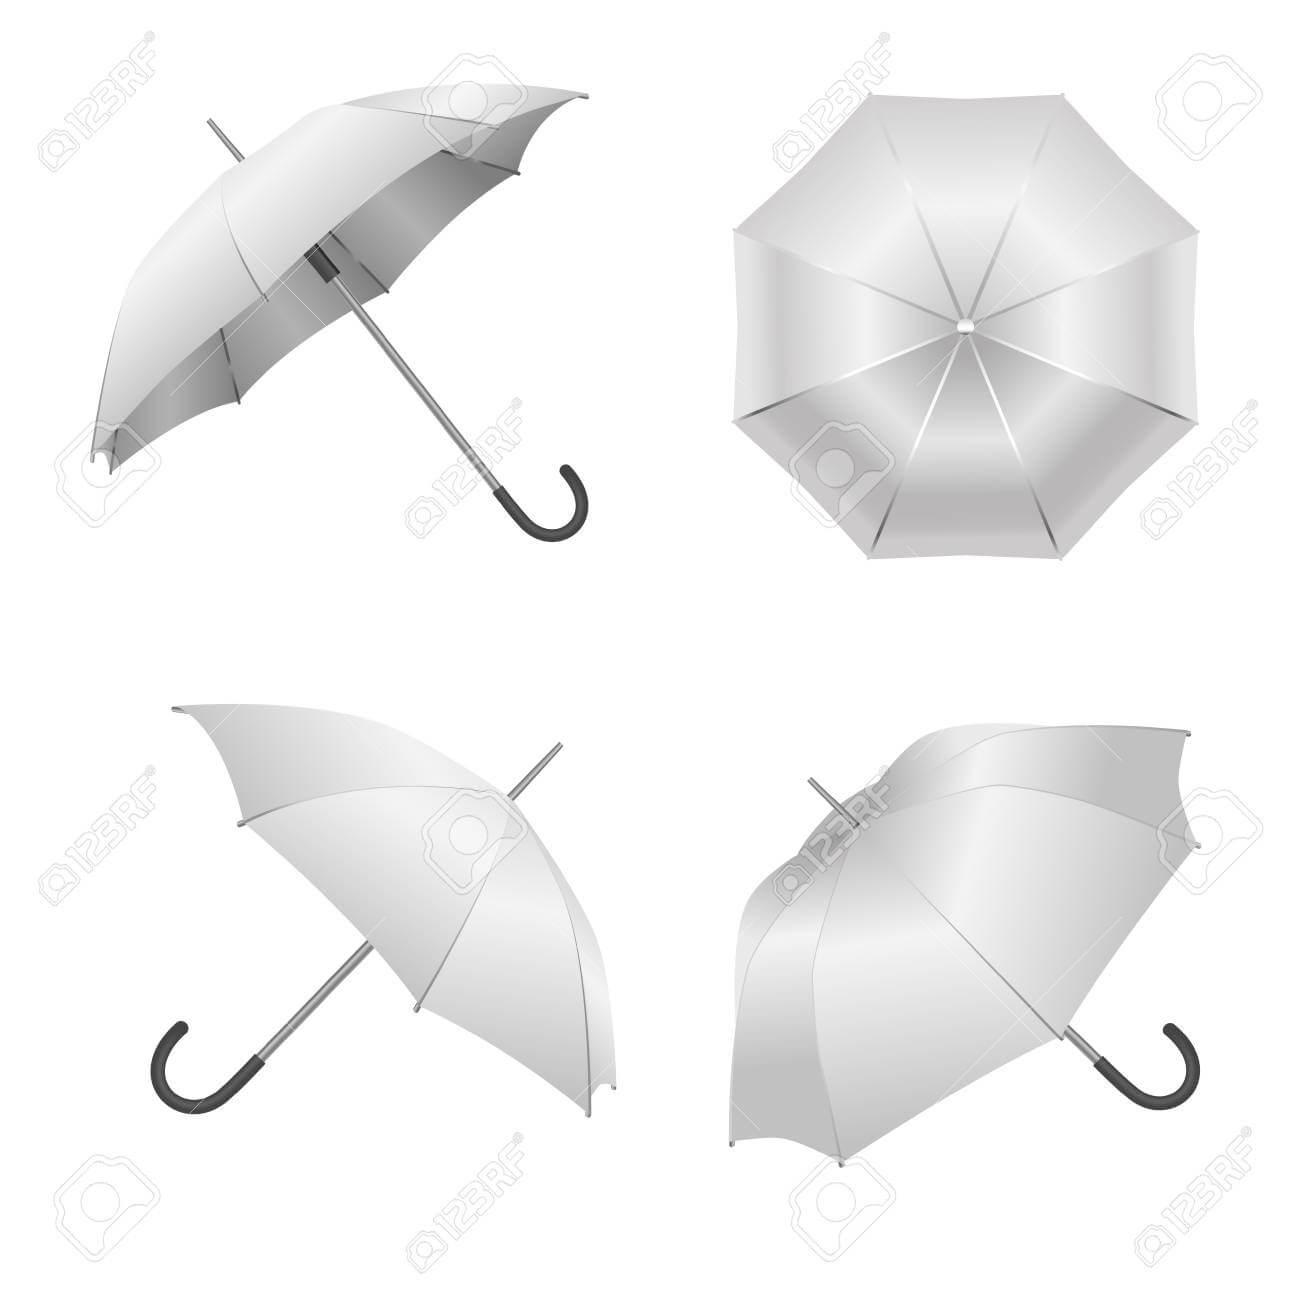 Realistic Detailed 3D White Blank Umbrella Template Mockup Set.. Inside Blank Umbrella Template